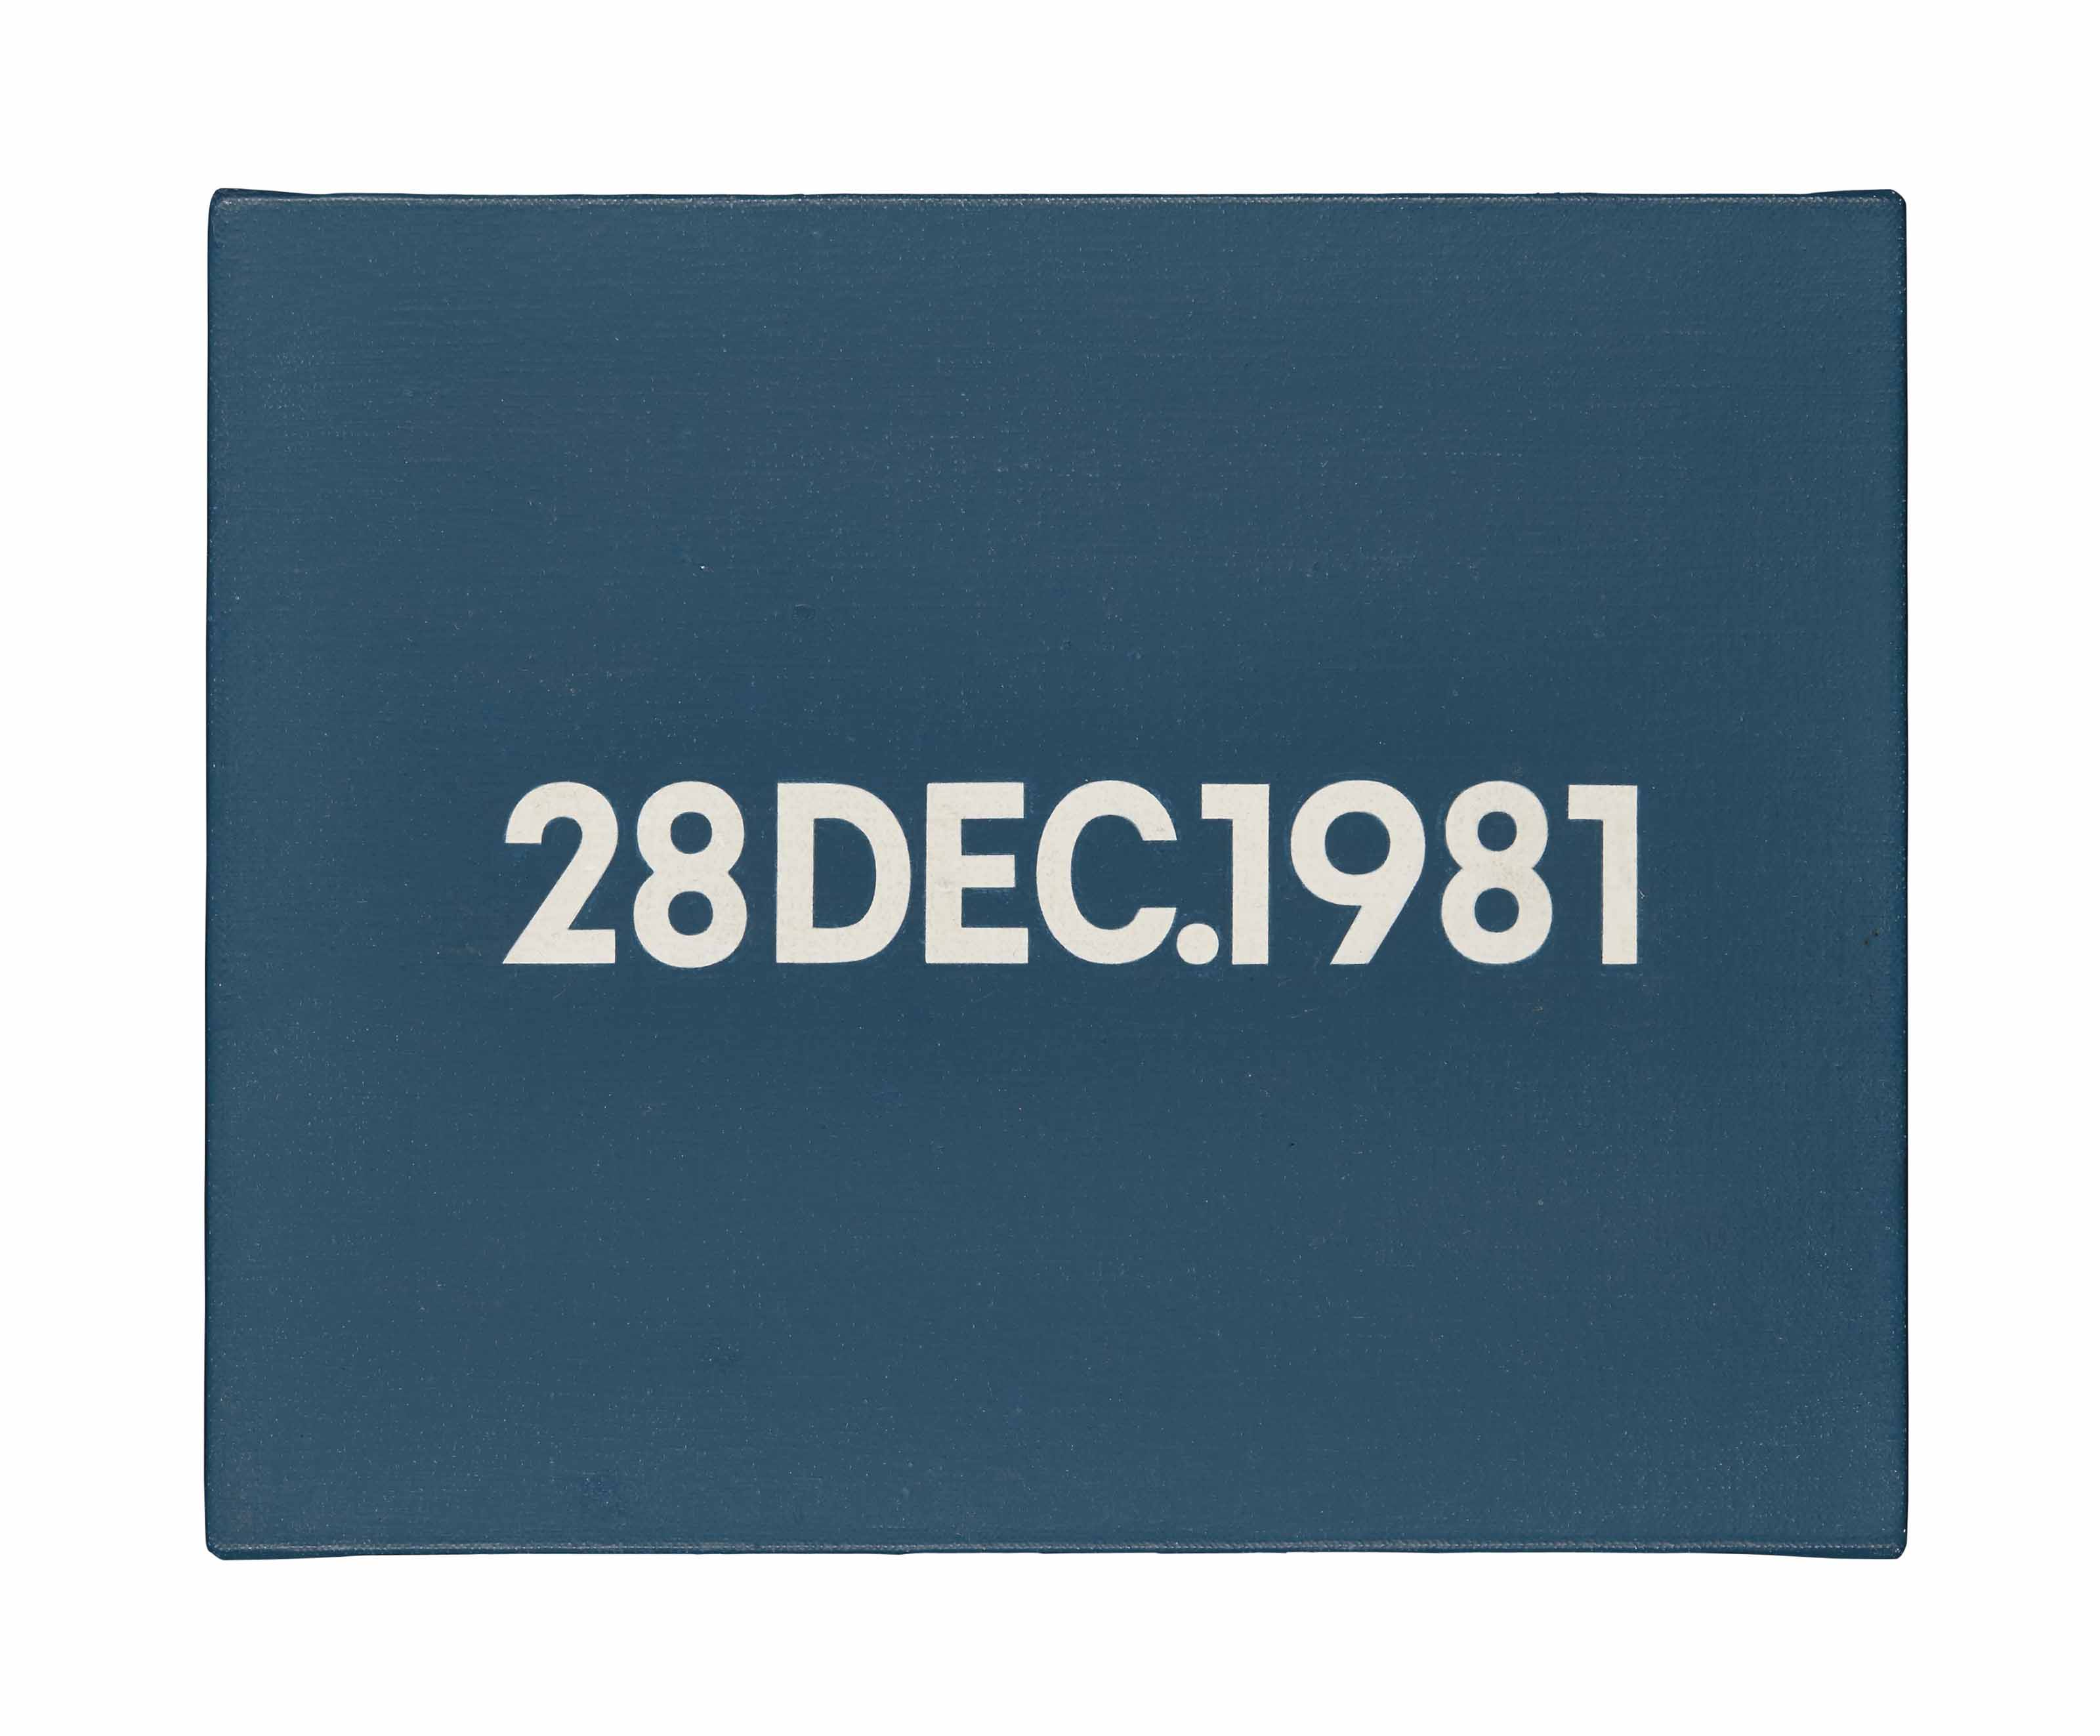 28 DEC. 1981